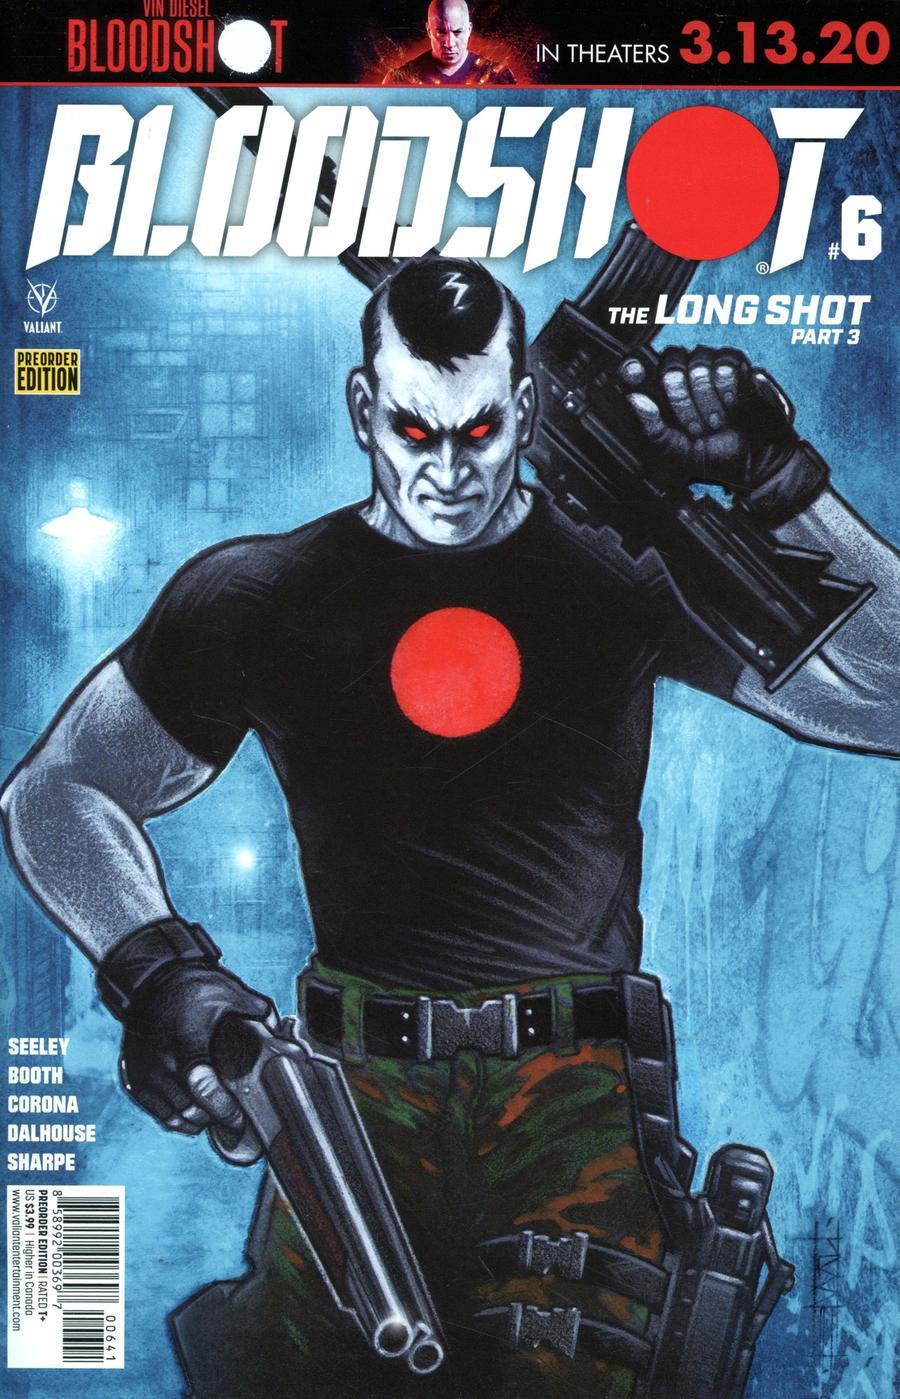 Bloodshot Vol 4 #6 Cover D Variant Pre-Order Edition